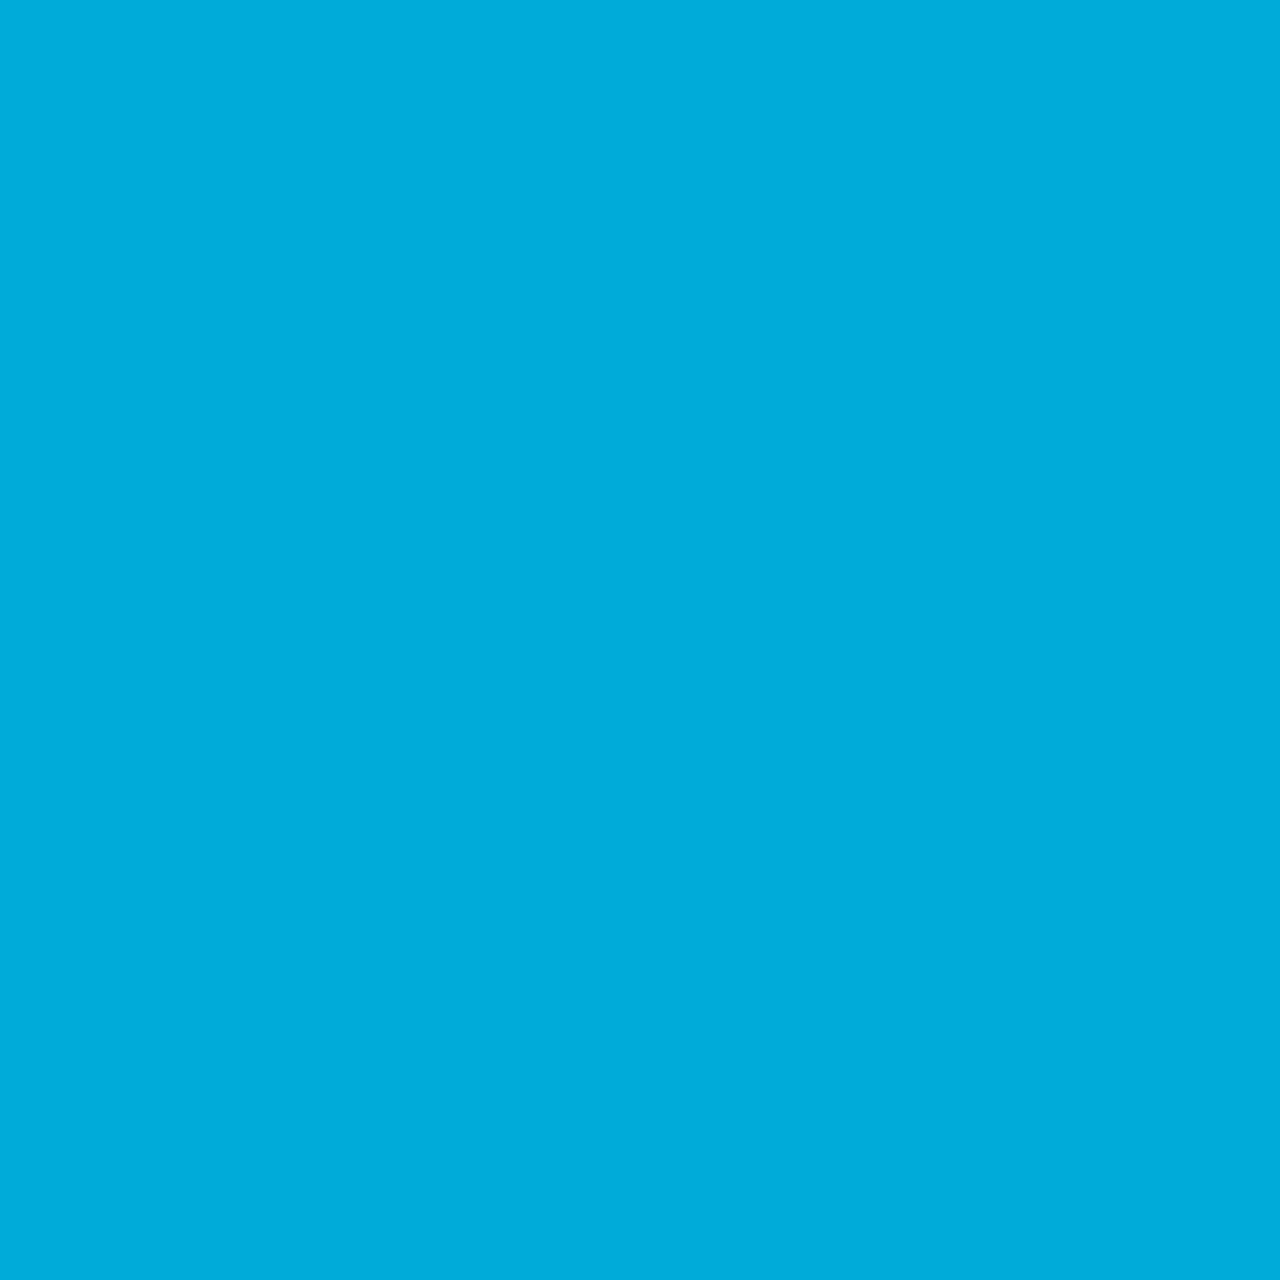 "#0072 Rosco Gels Roscolux Azure Blue, 20x24"""